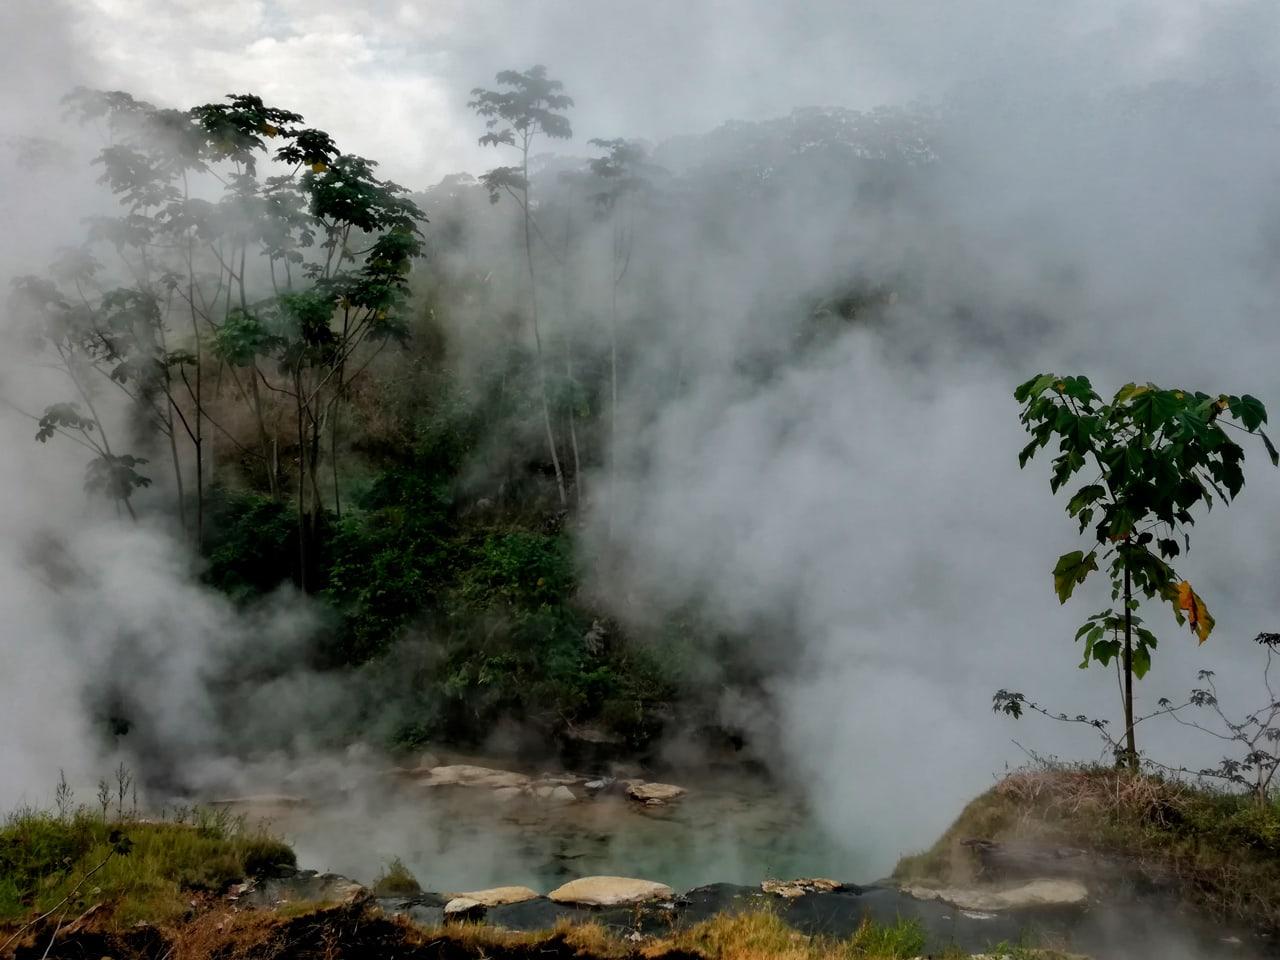 Gorące źródƗa w Peru w Pucallpa